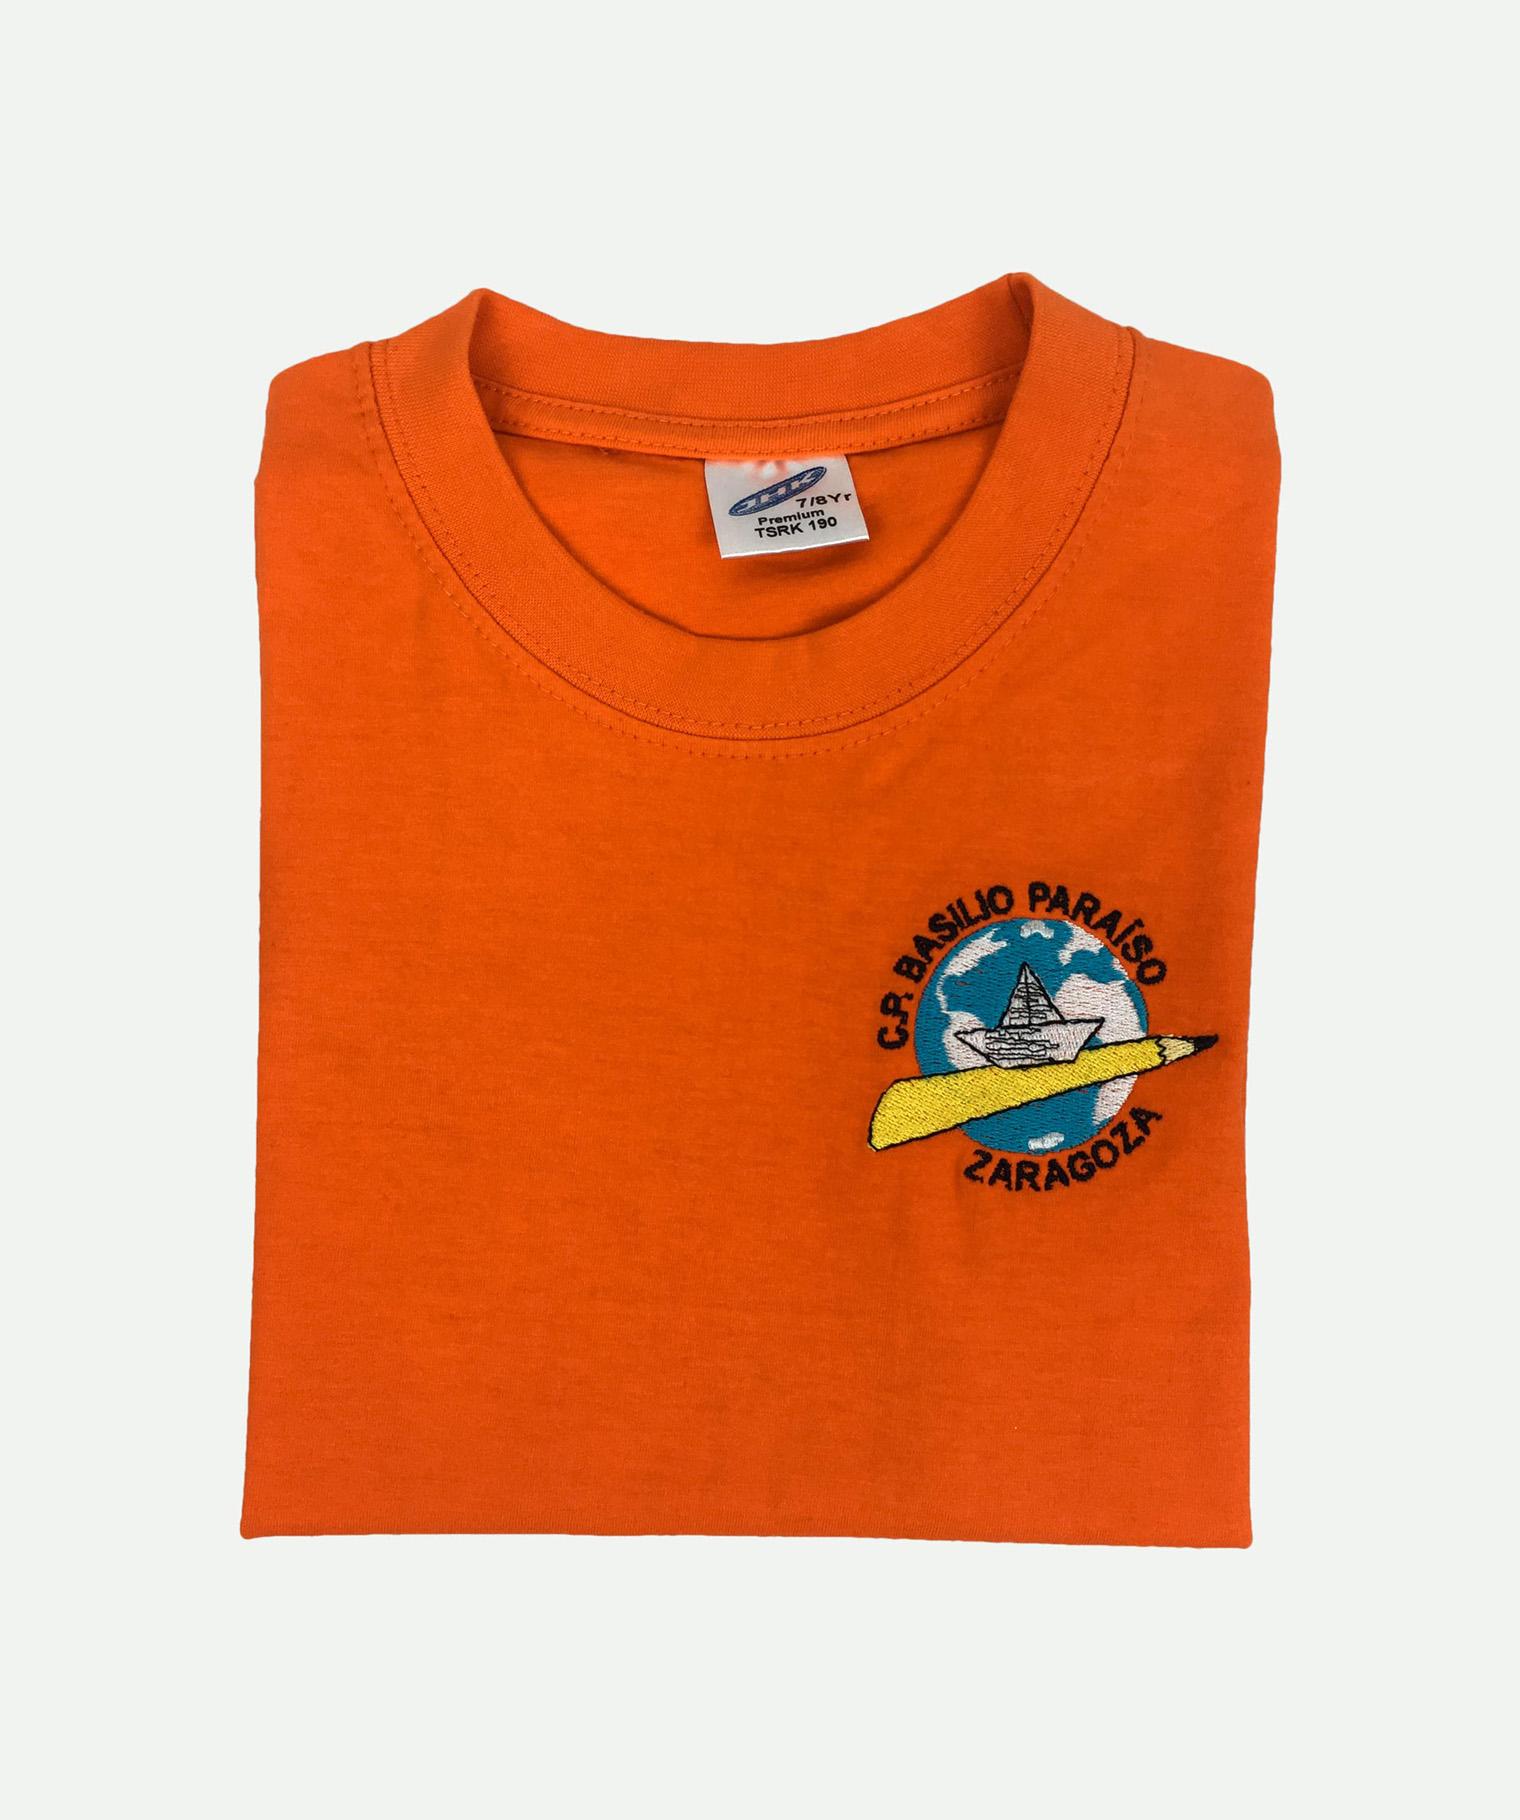 Camiseta bordada de niño naranja